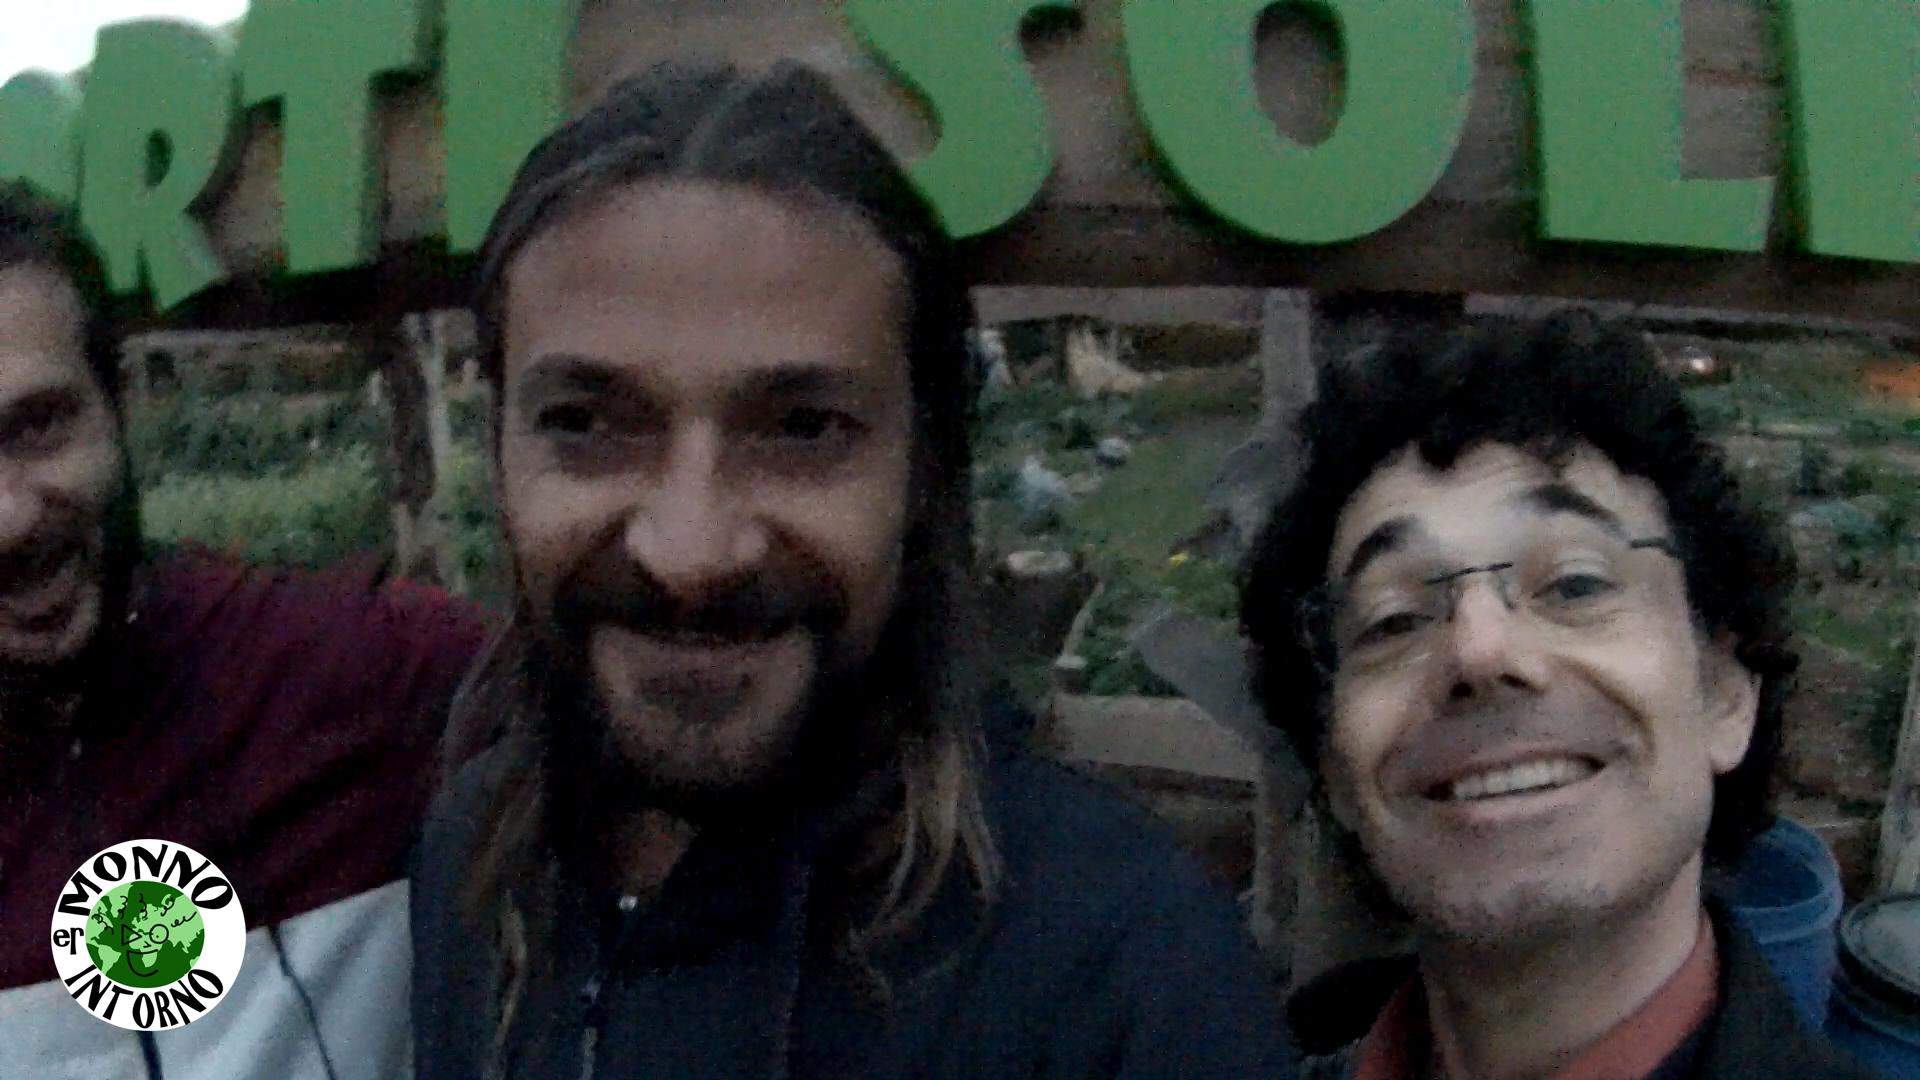 ORTI SOLIDALI Montebelluna_Mauro Flora_Igor Francesacto_Francesco Musumeci